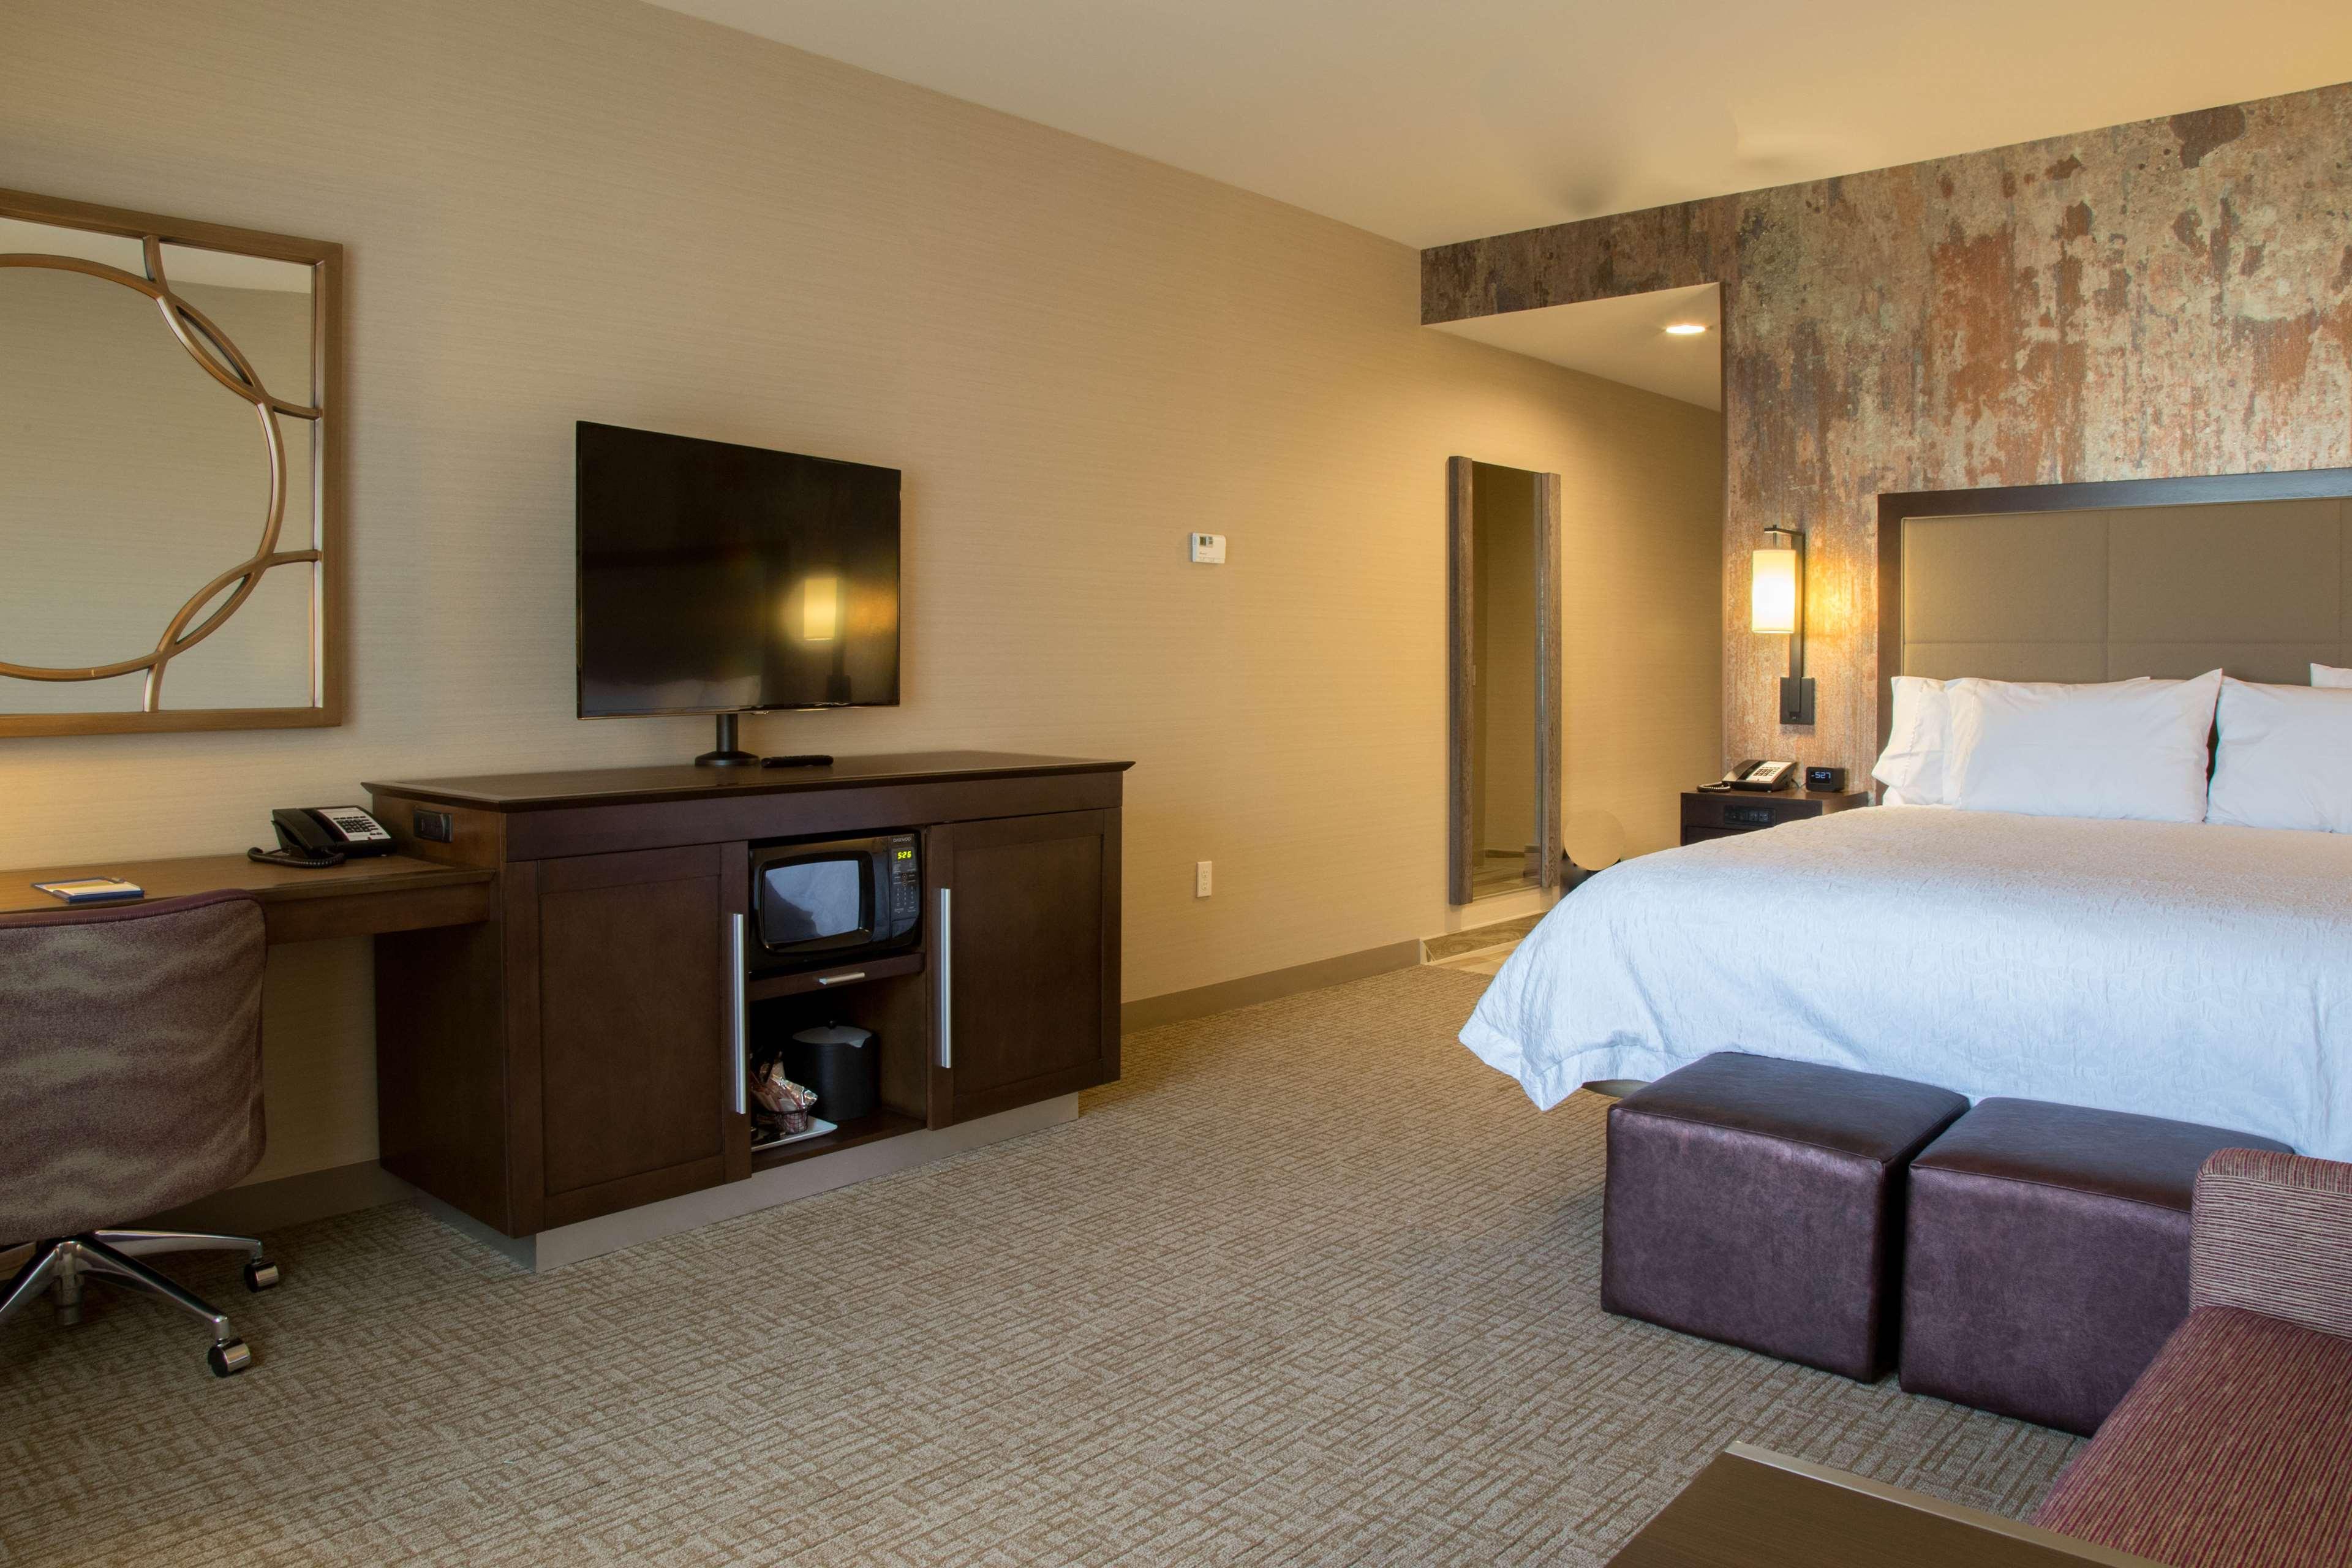 Hampton Inn & Suites Murrieta Temecula image 14